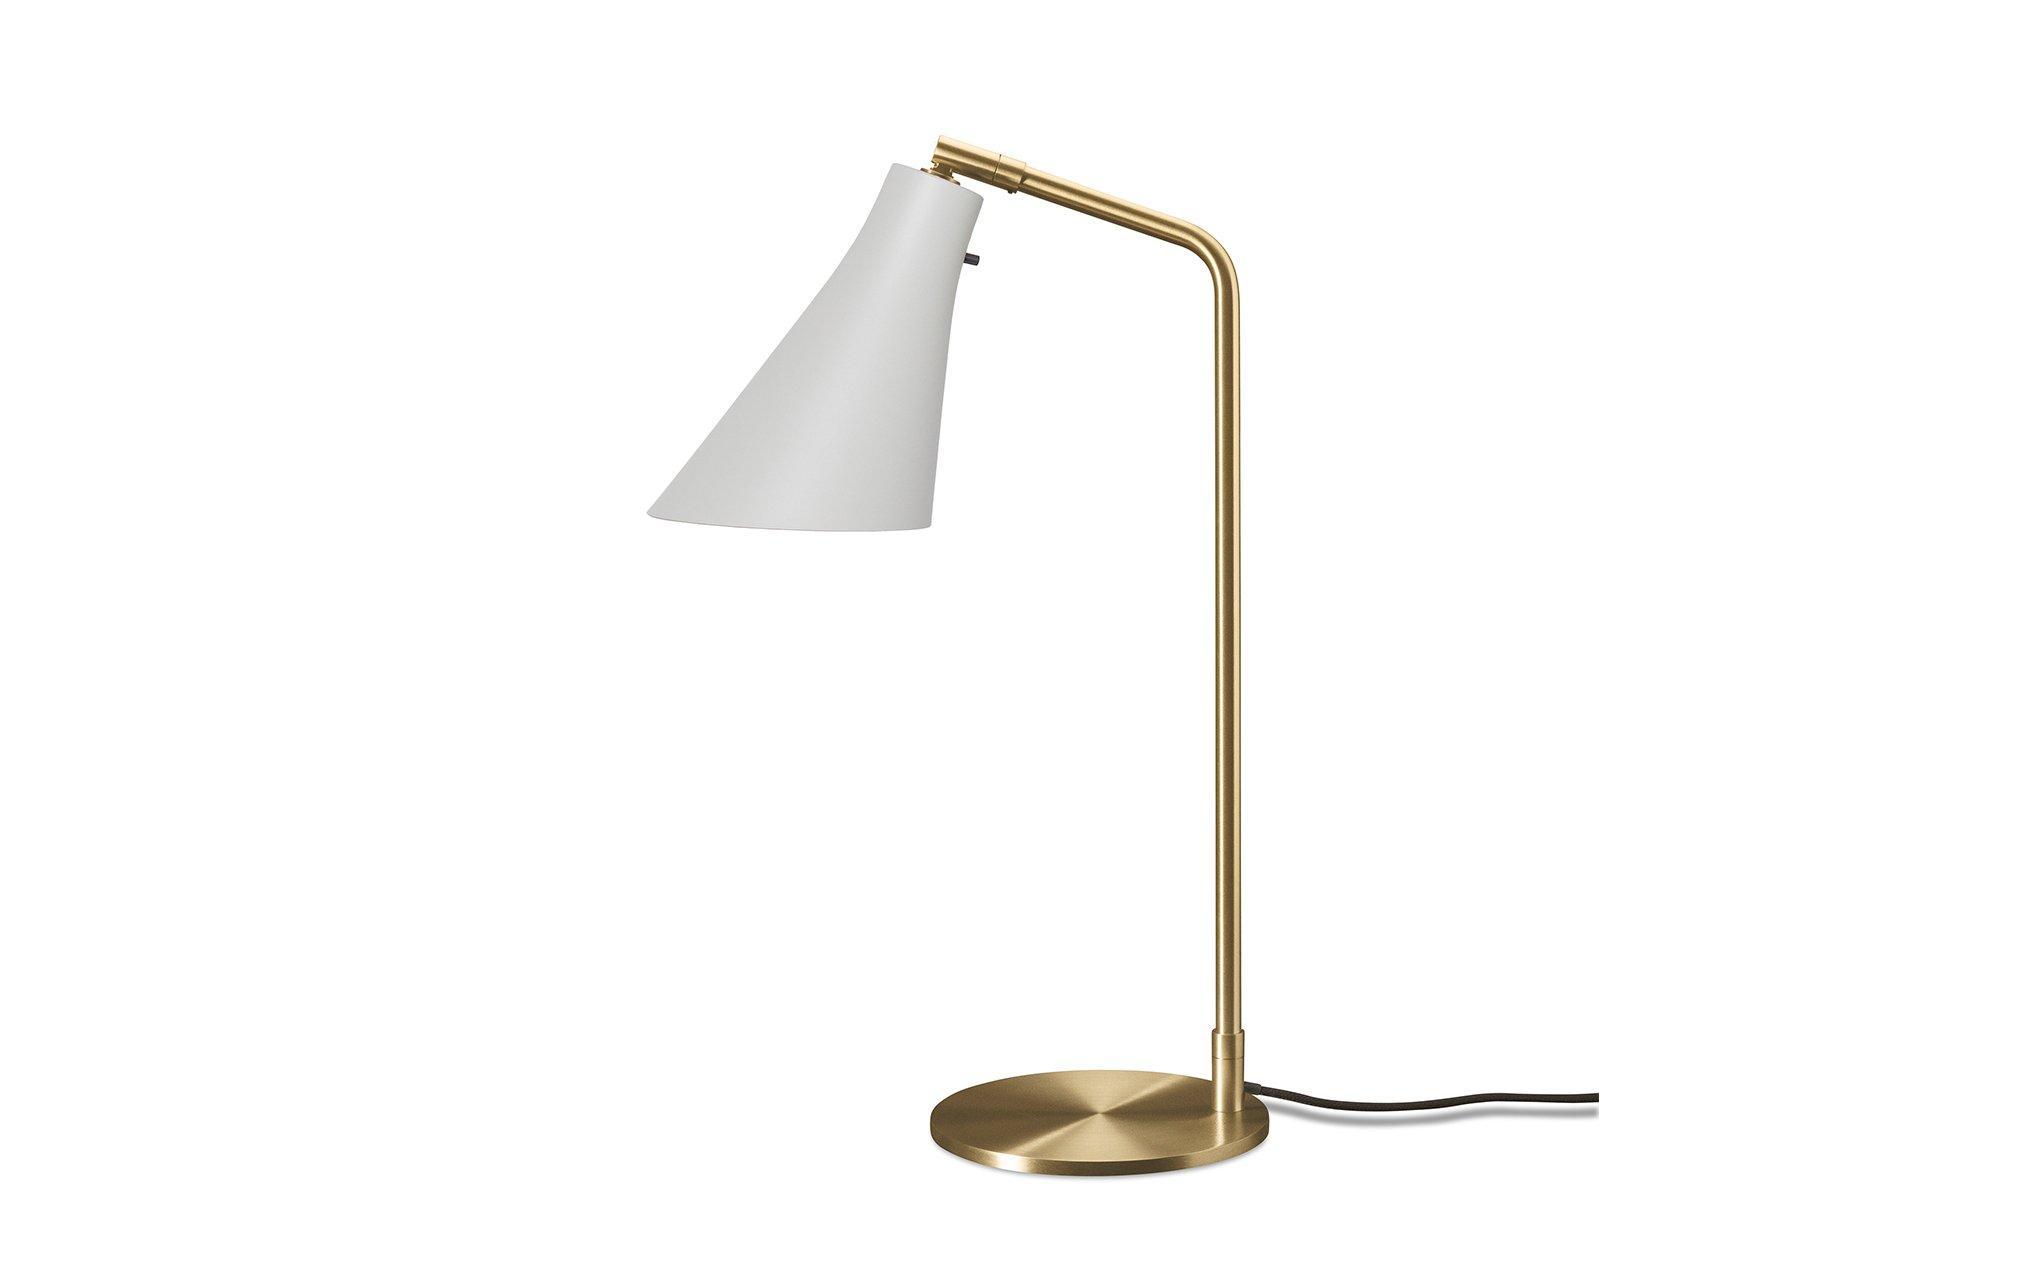 Lampe Horn Akari